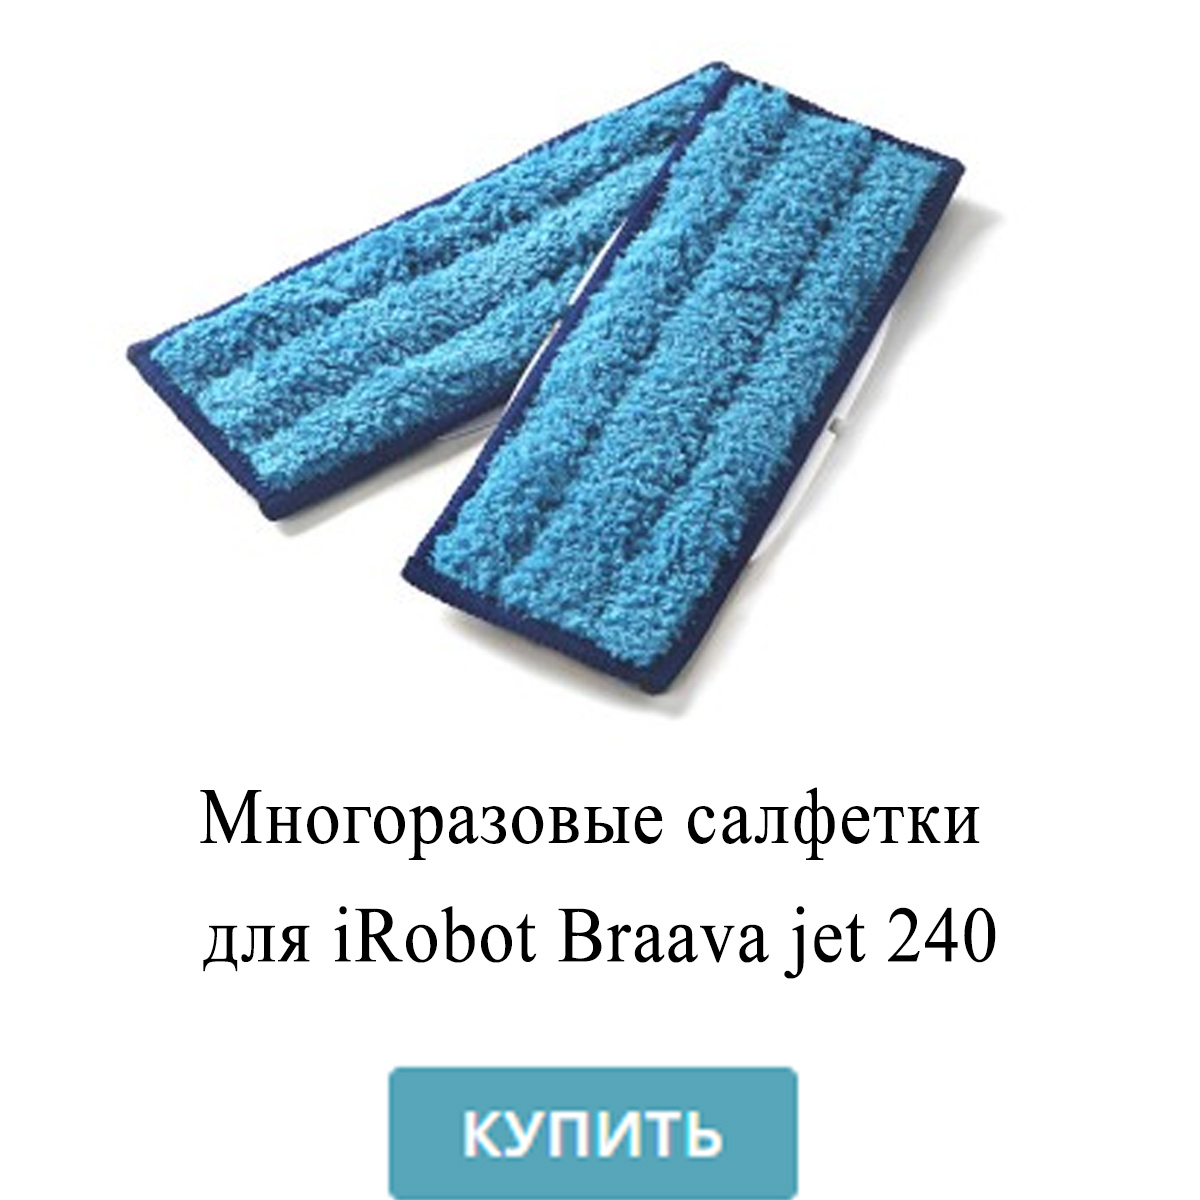 Многоразовые салфетки для iRobot Braava jet 240